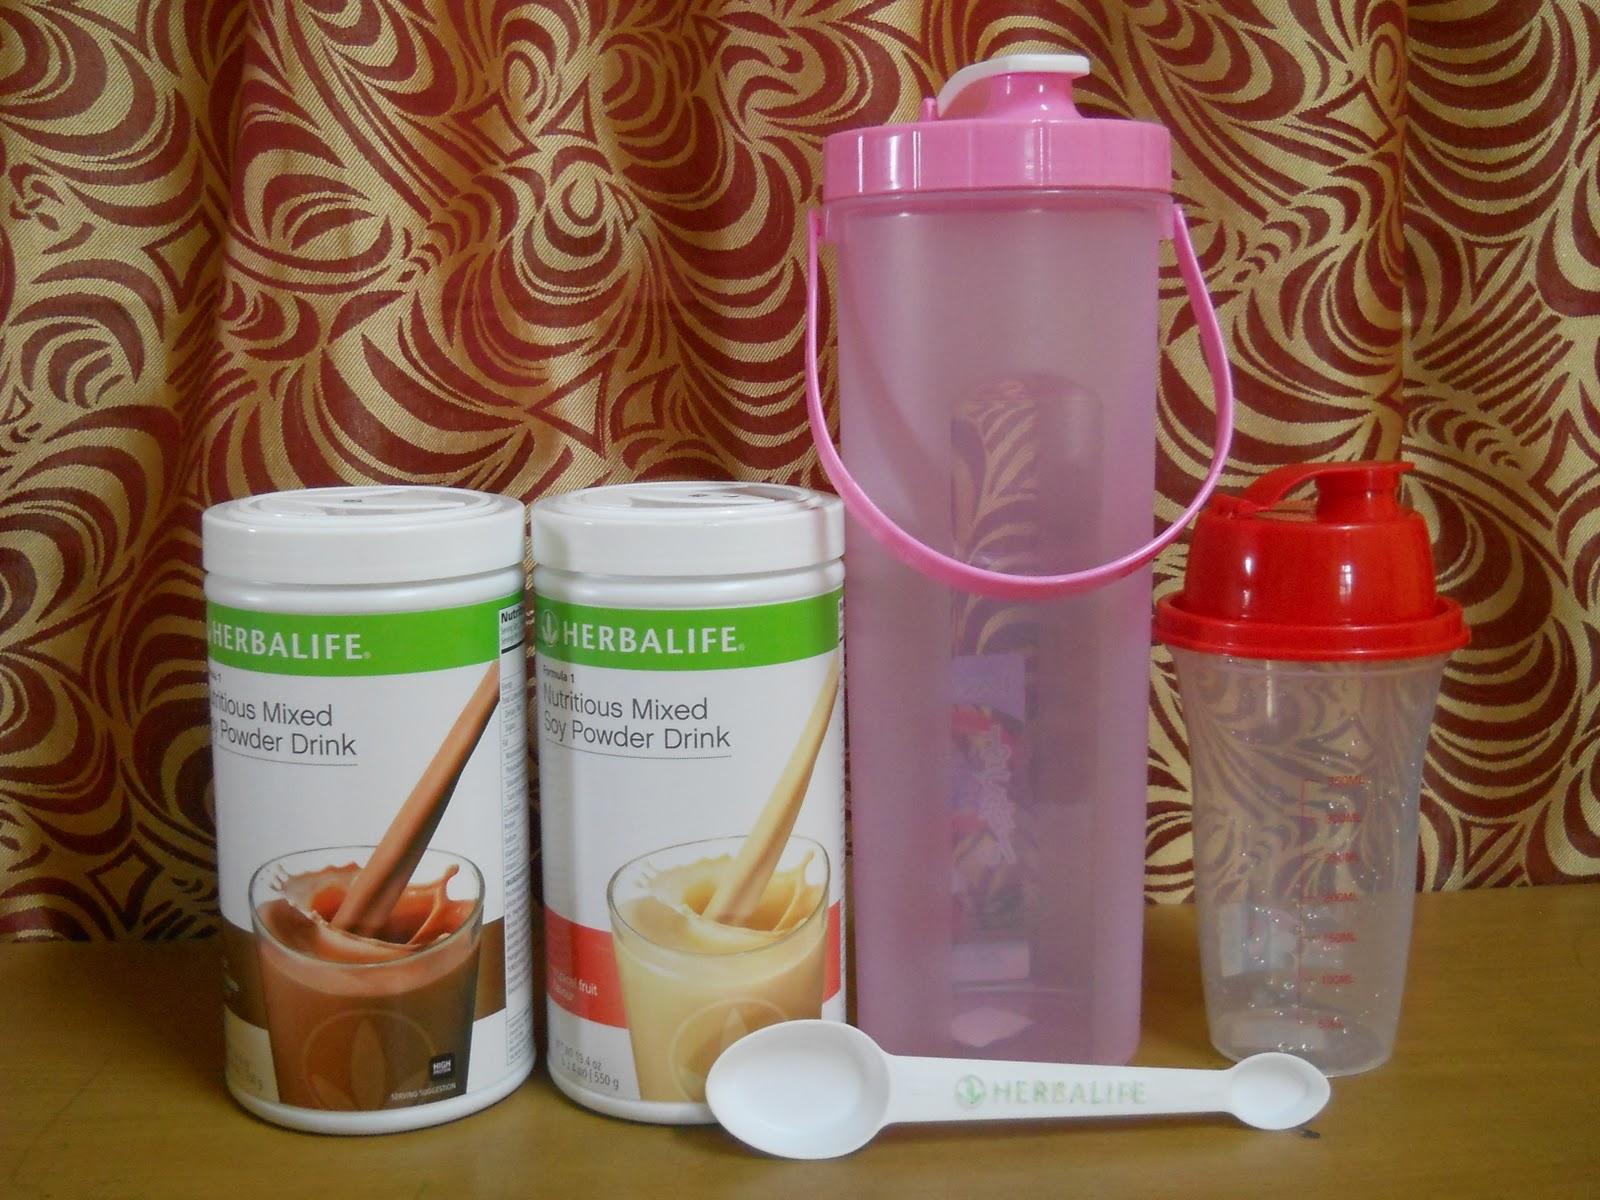 Botol Minum Bulat Daftar Harga Terkini Dan Termurah Indonesia Elektronik Lunch Box Sj0052 Dengan Pembelian 2 Shake Formula 1 550 G Rm 32800